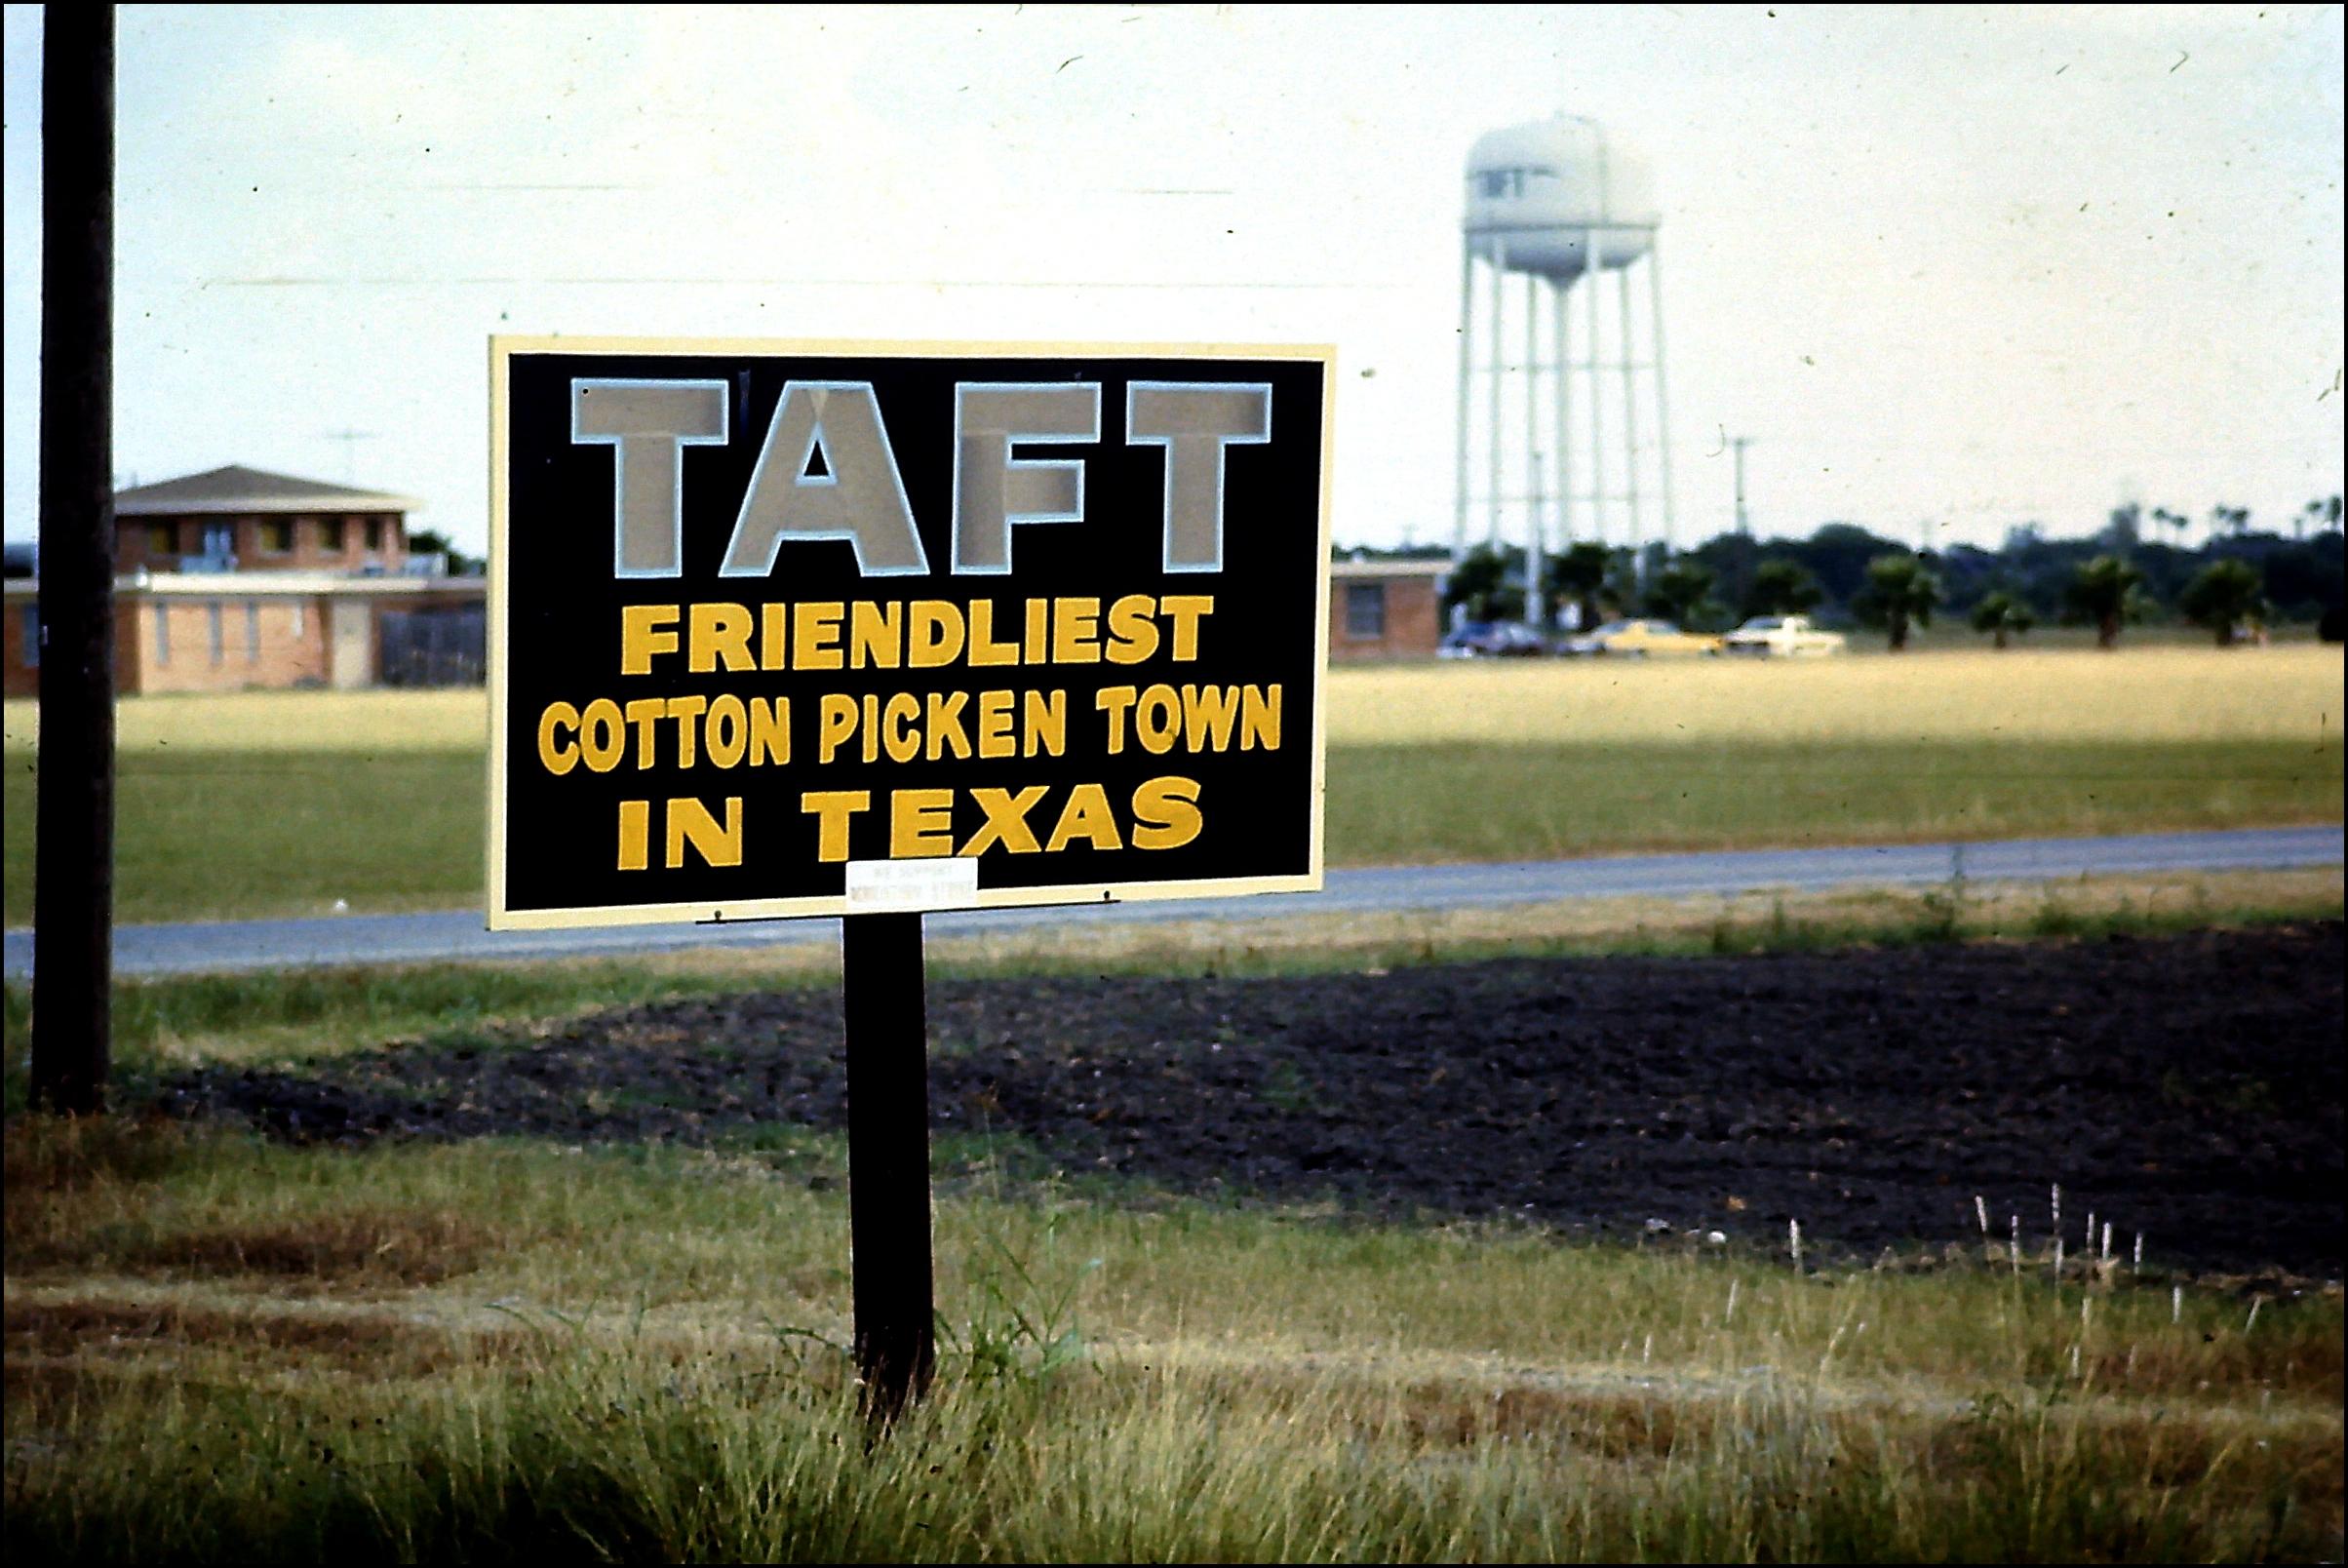 تفت، تگزاس